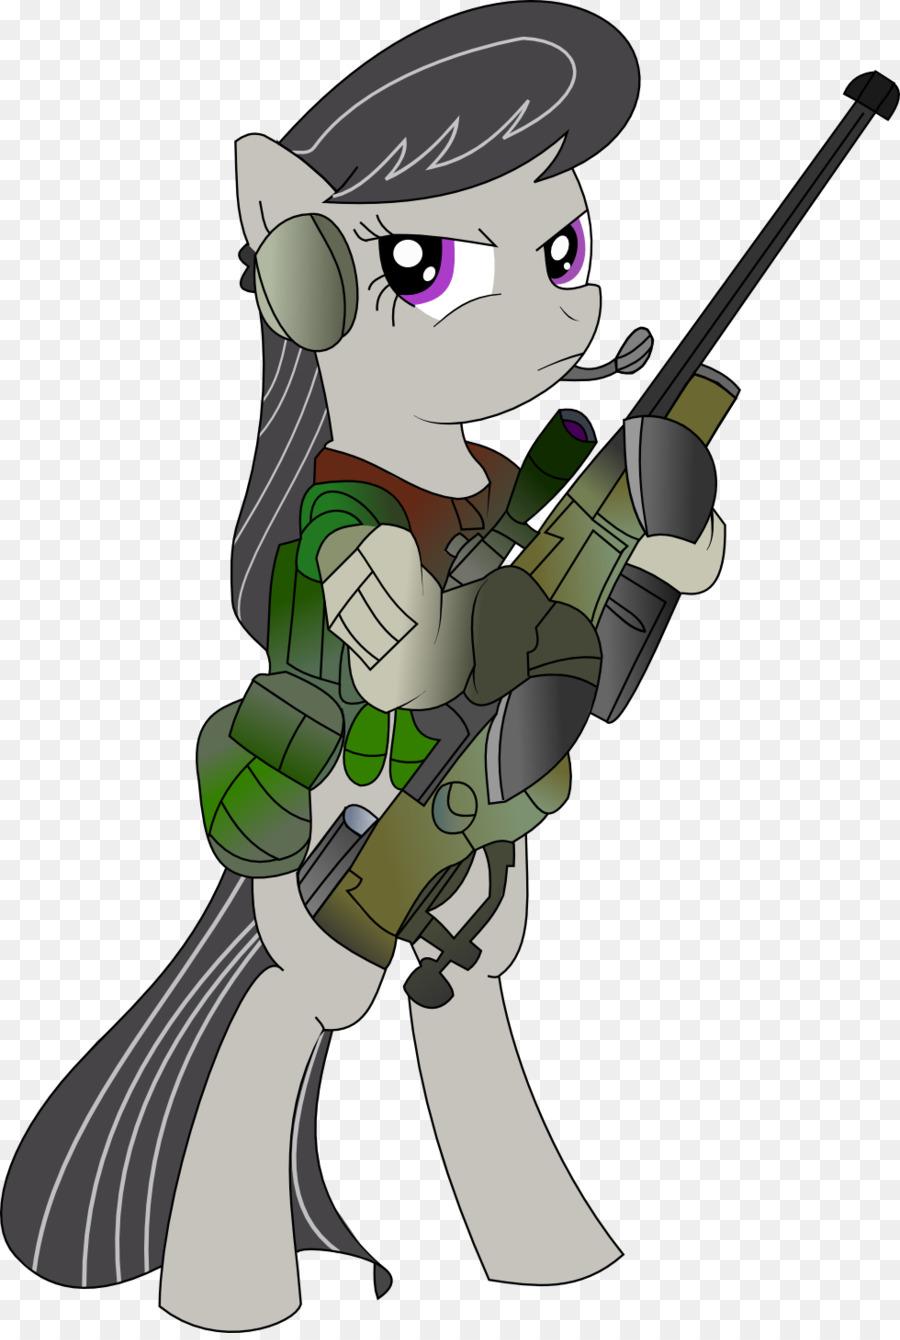 Pony Twilight Sparkle Applejack Rainbow Dash Pinkie Pie - sniper elite